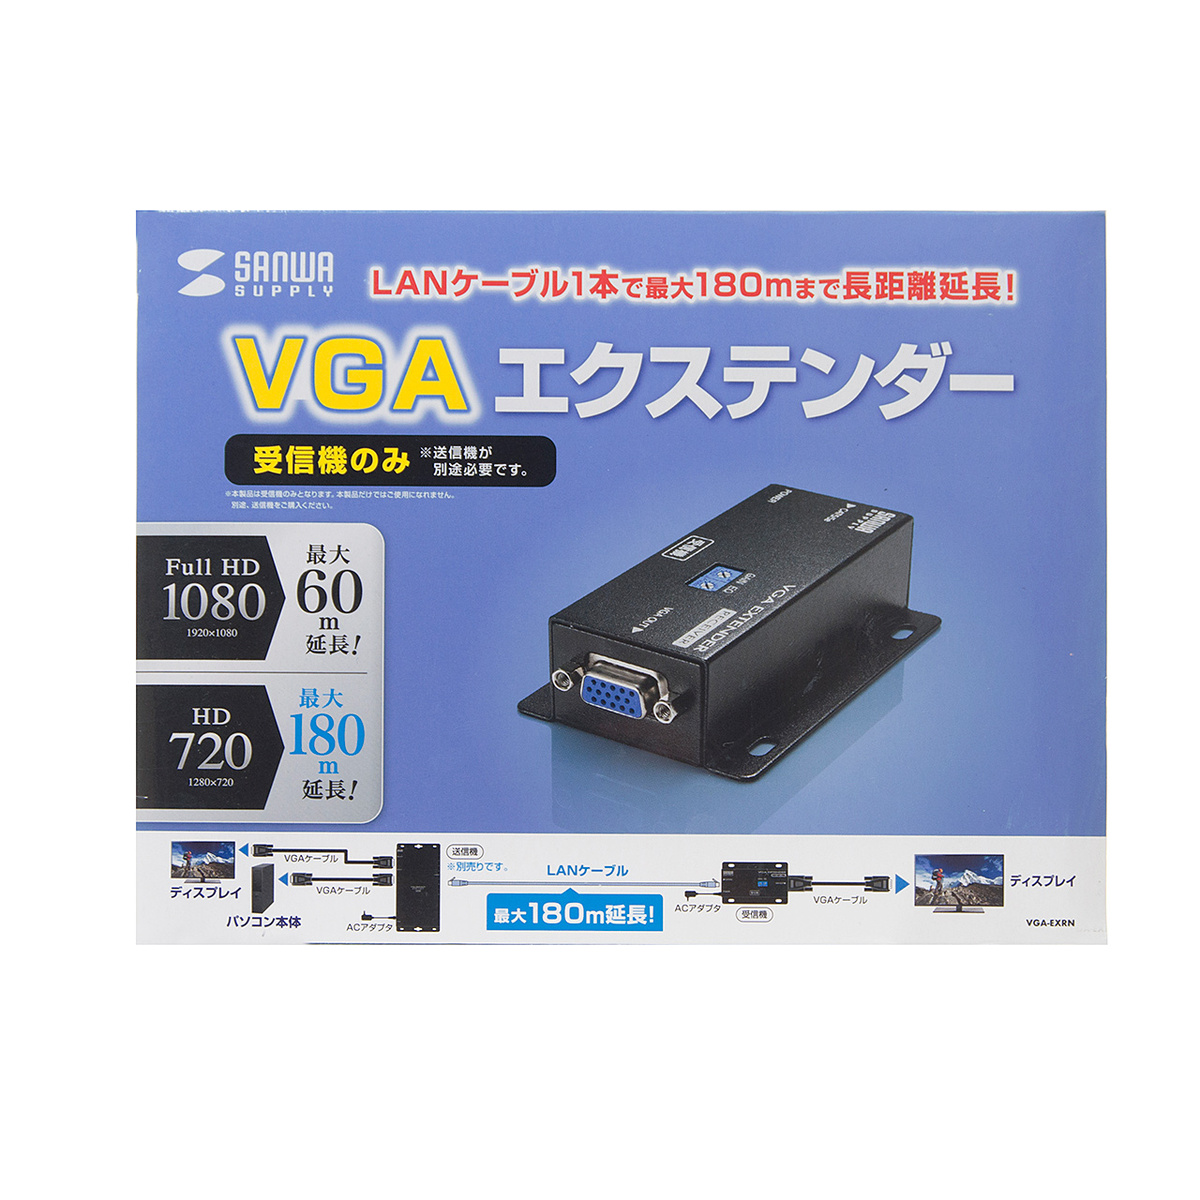 [VGA-EXRN] ディスプレイエクステンダー(受信機)